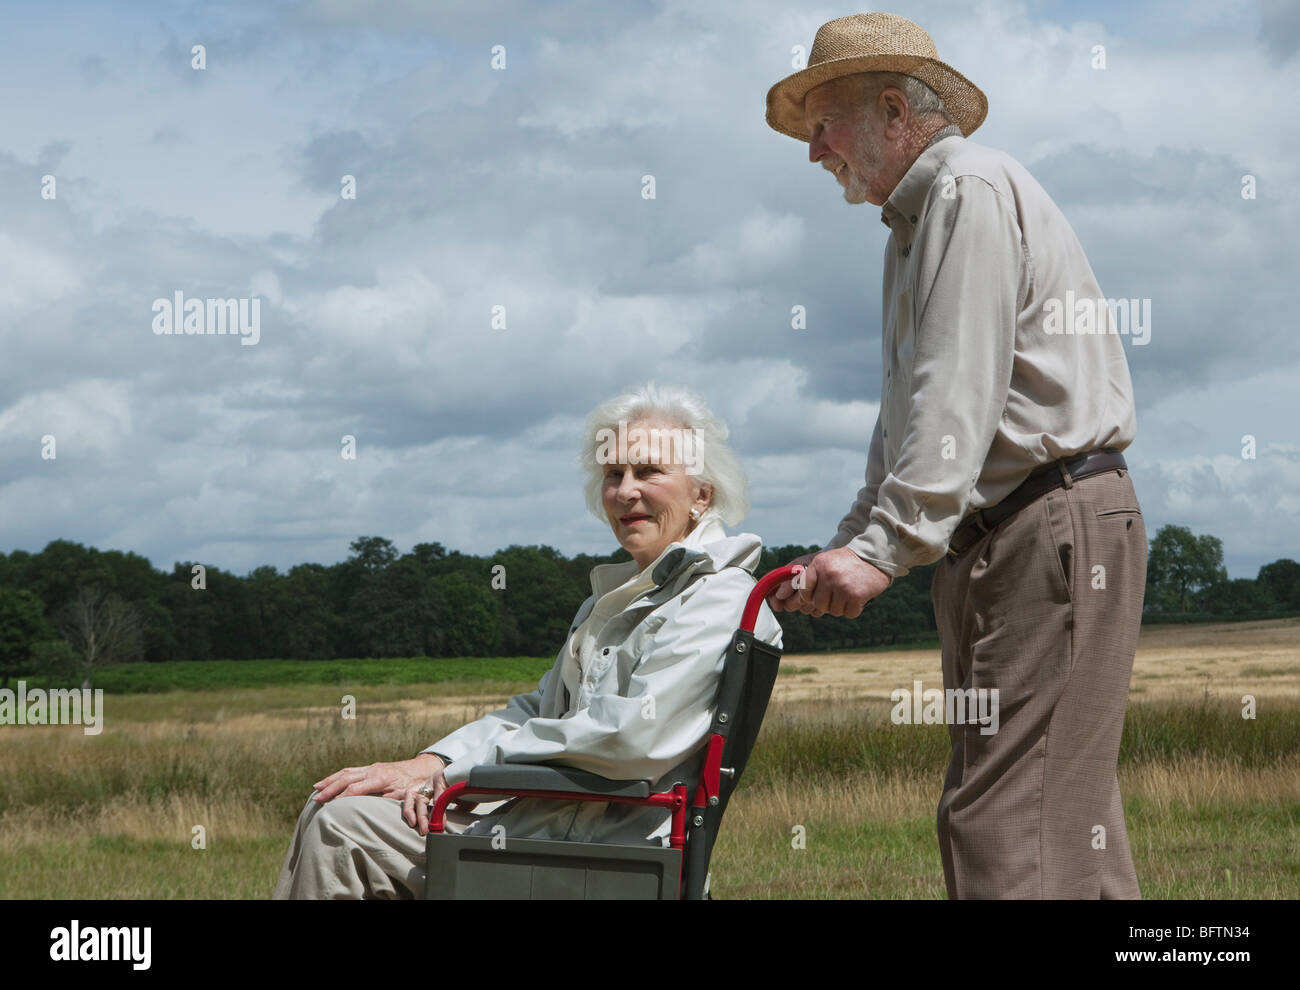 Personnes âgées man pushing woman in wheelchair Banque D'Images